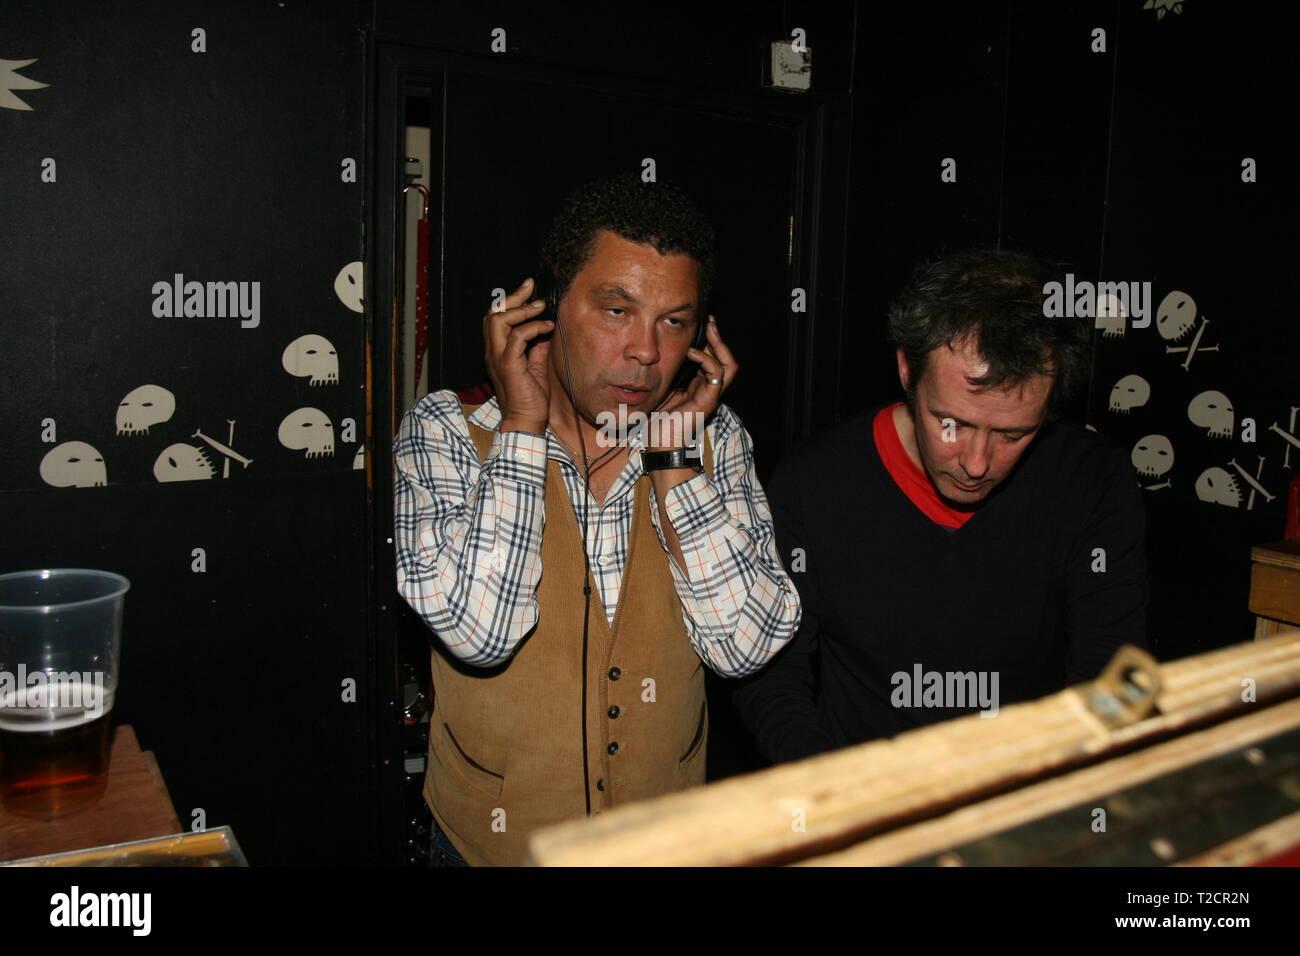 Liverpool,Uk Actor Craig Charles djs in Liverpool nightclub credit Ian Fairbrother/Alamy Stock Photos - Stock Image